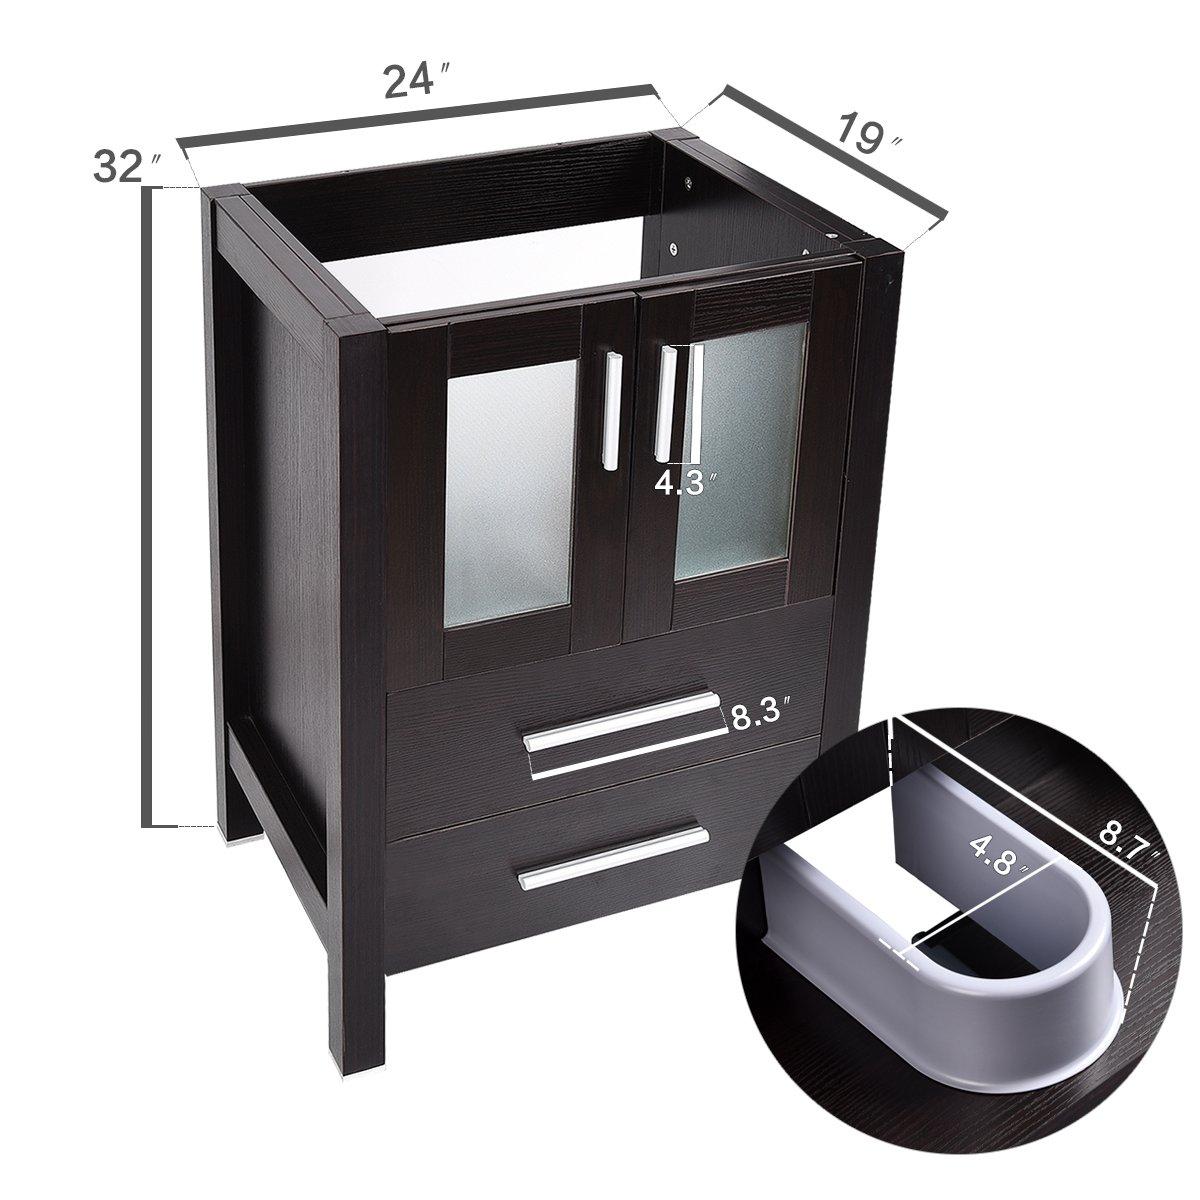 24-Inch Bathroom Vanity, Modern Stand Pedestal Cabinet, with Rectangle Ceramic Undermount Vessel Vanity Sink, Wood Black Fixture by PULUOMIS (Image #2)